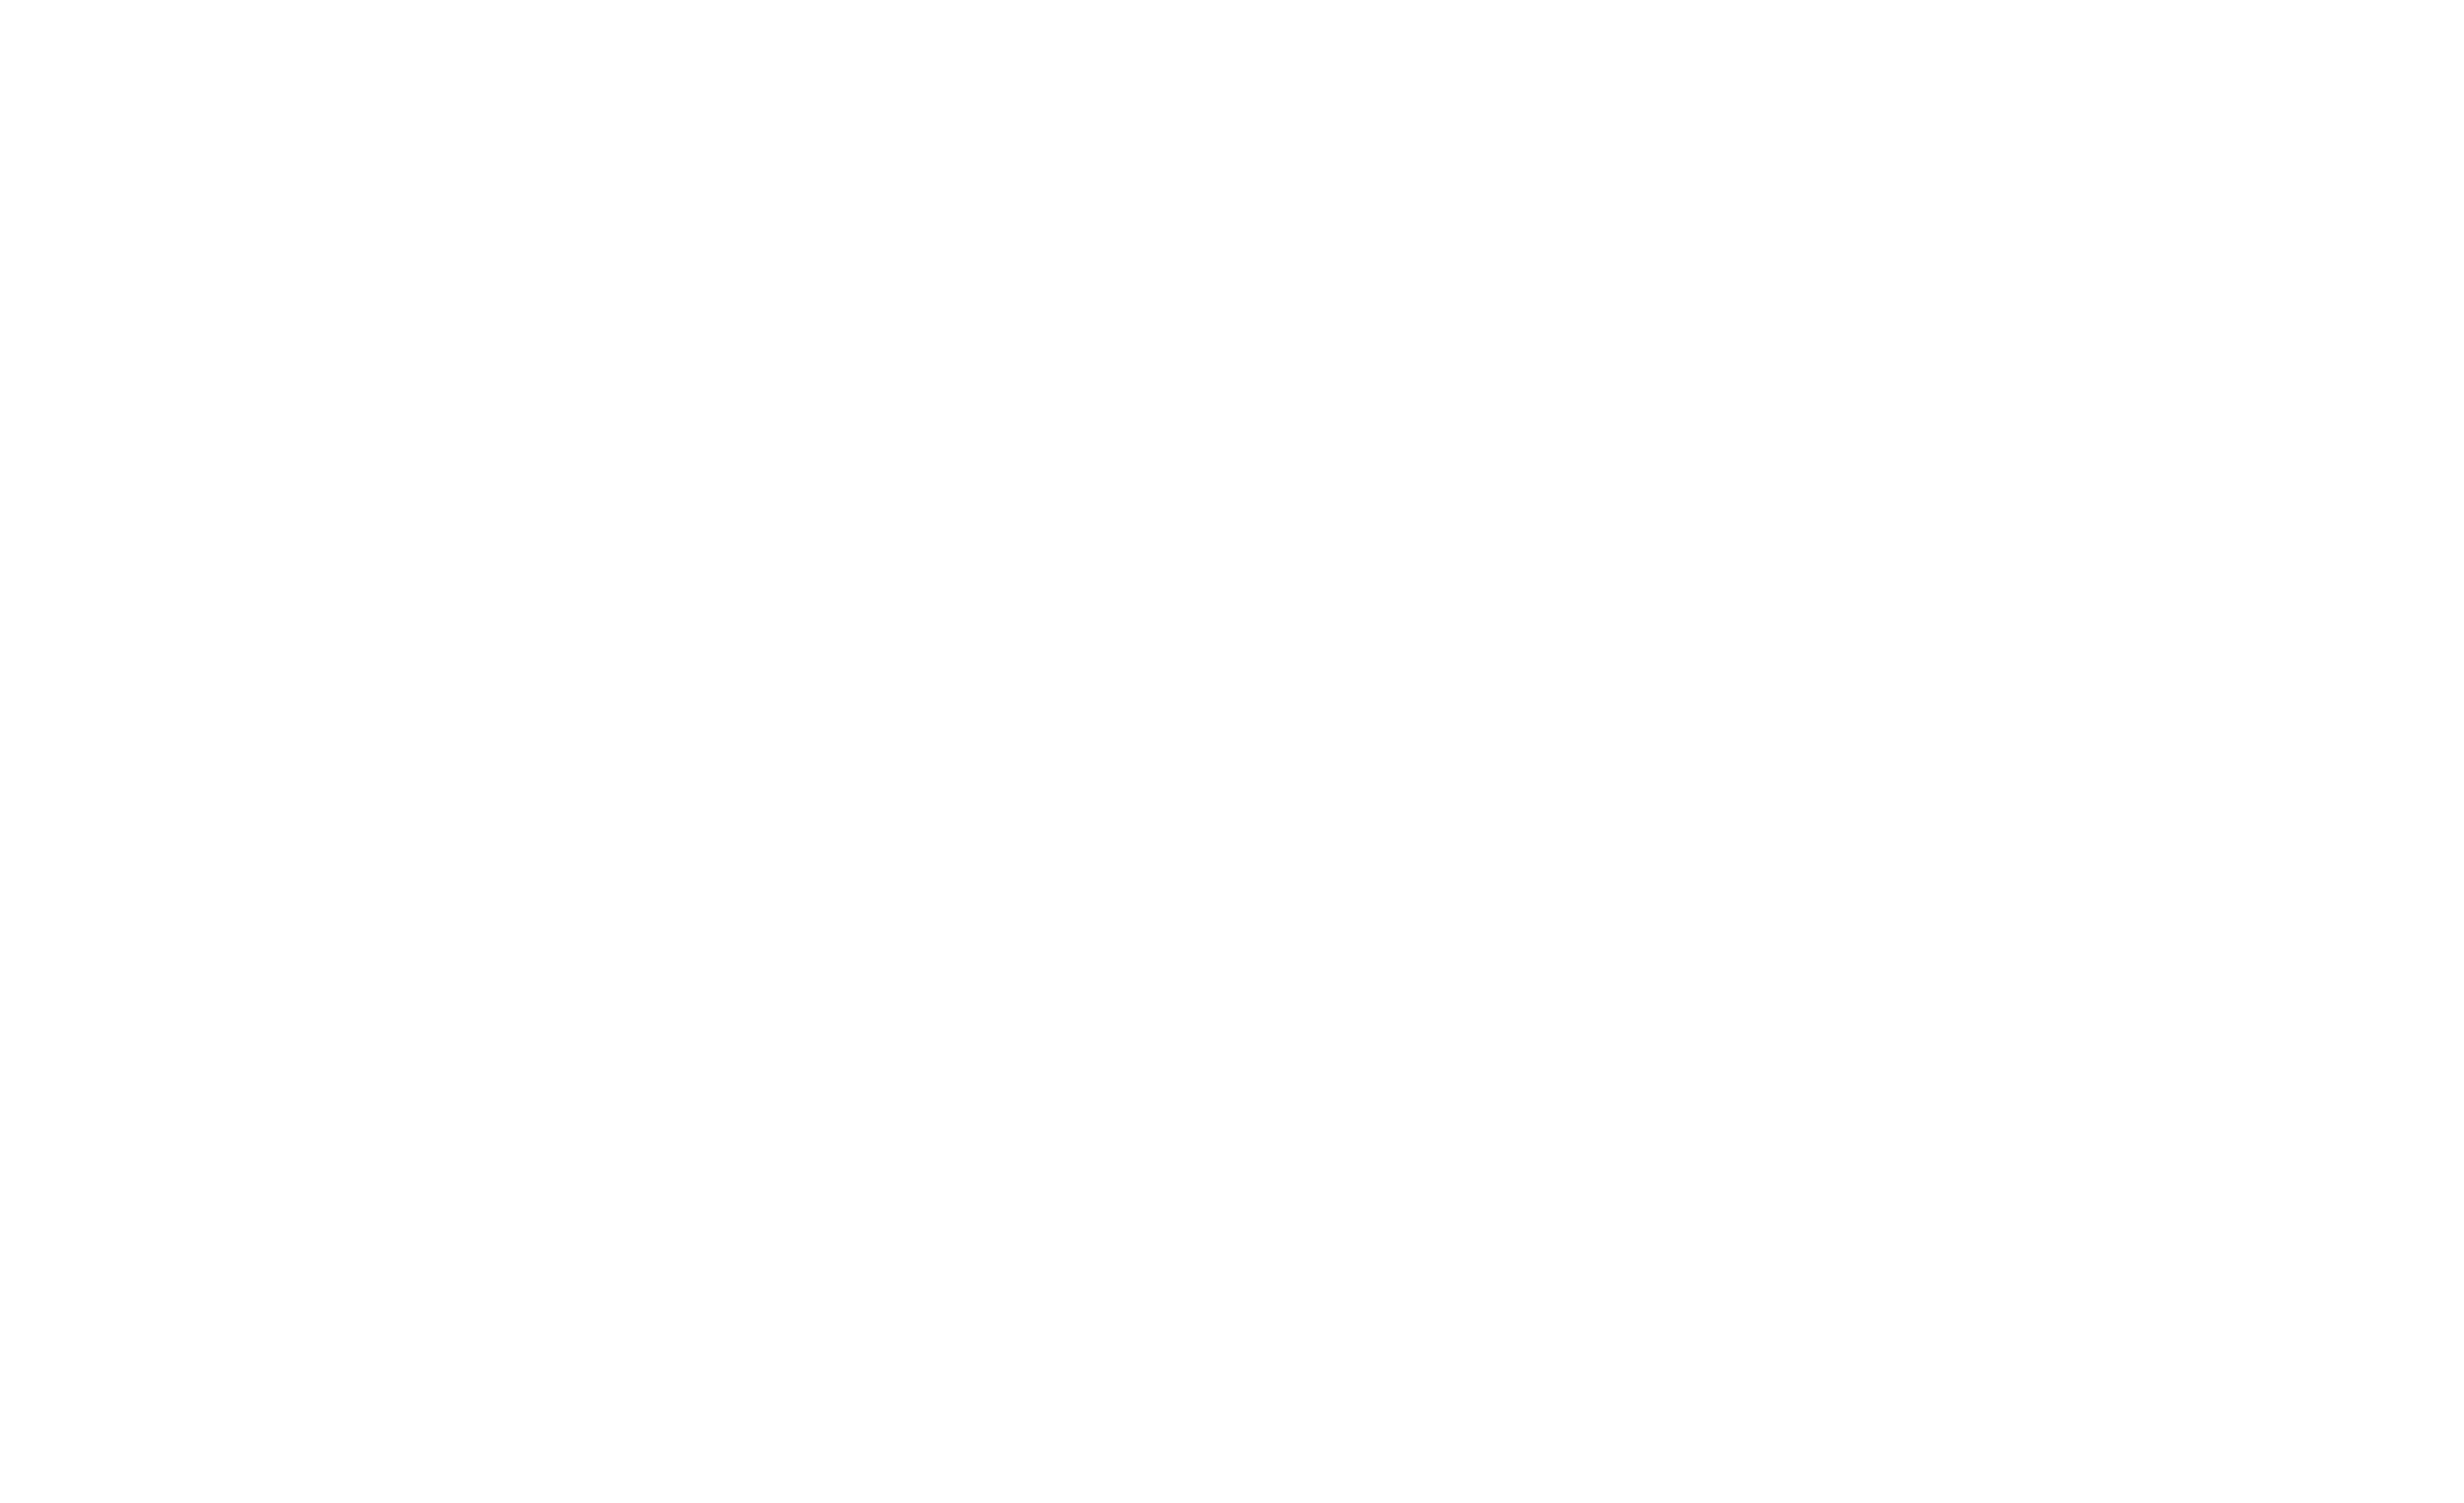 Eloá Amend